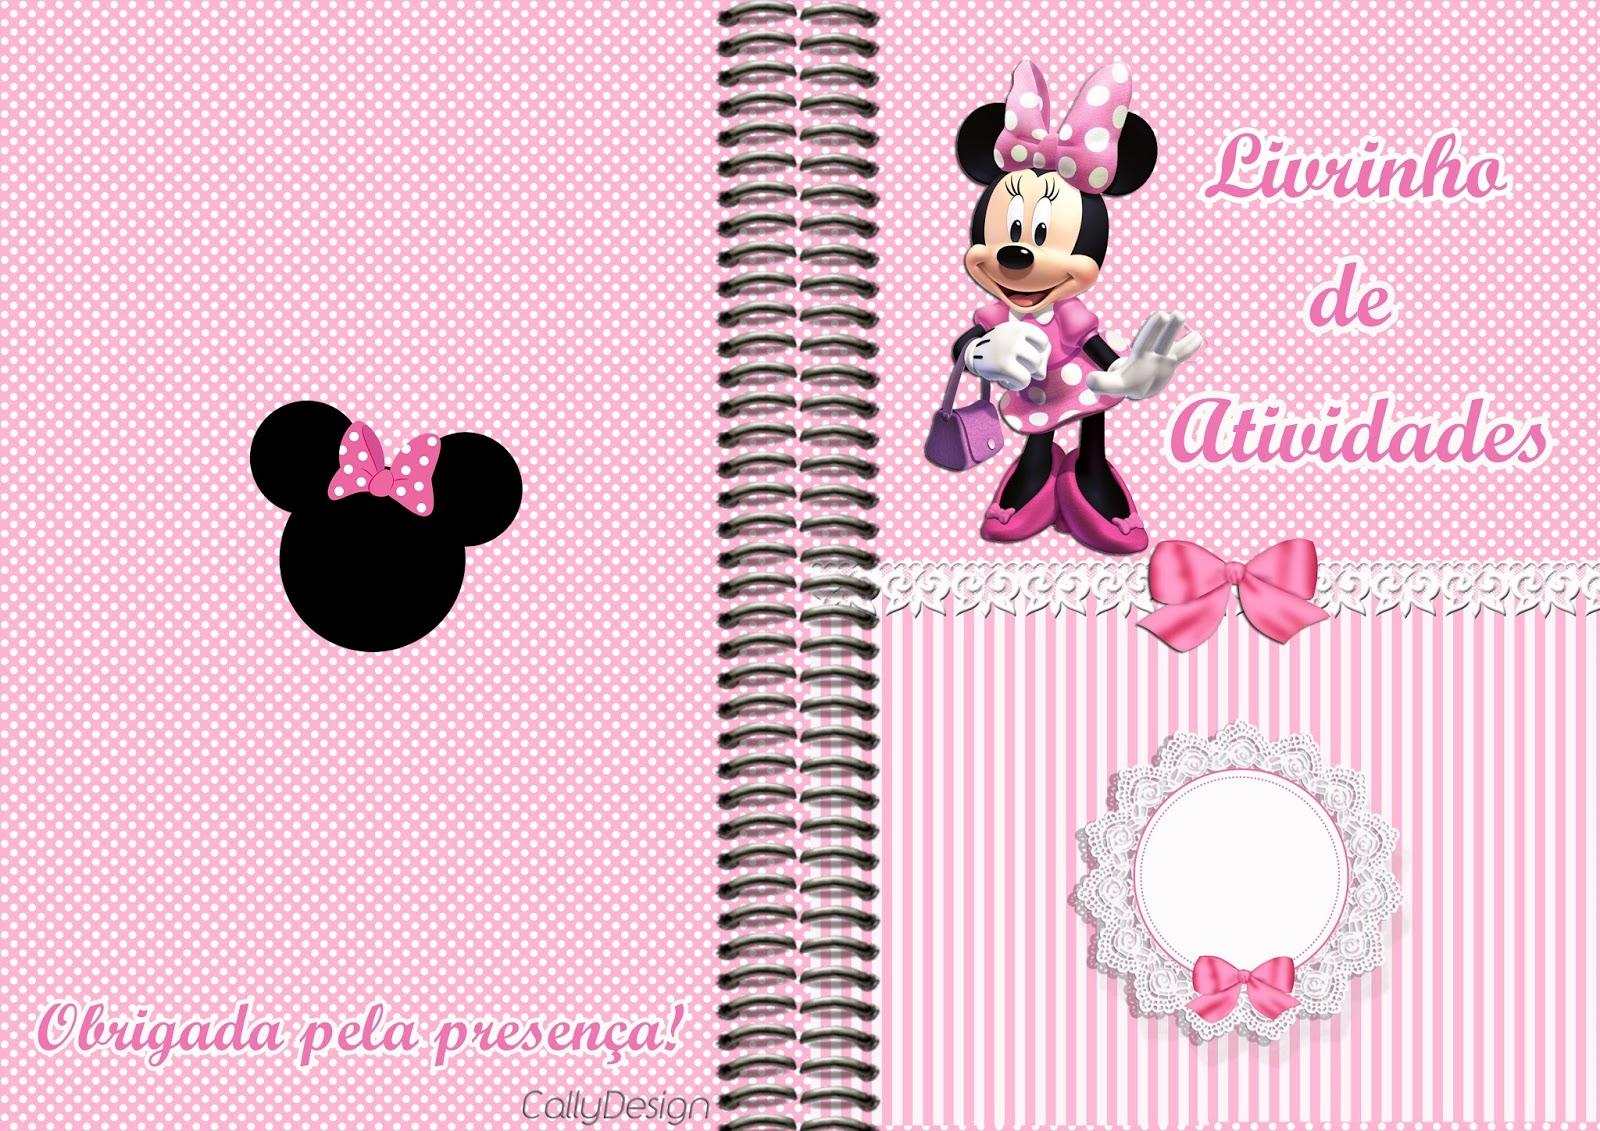 Minnie Baby Shower Invitations is beautiful invitations example